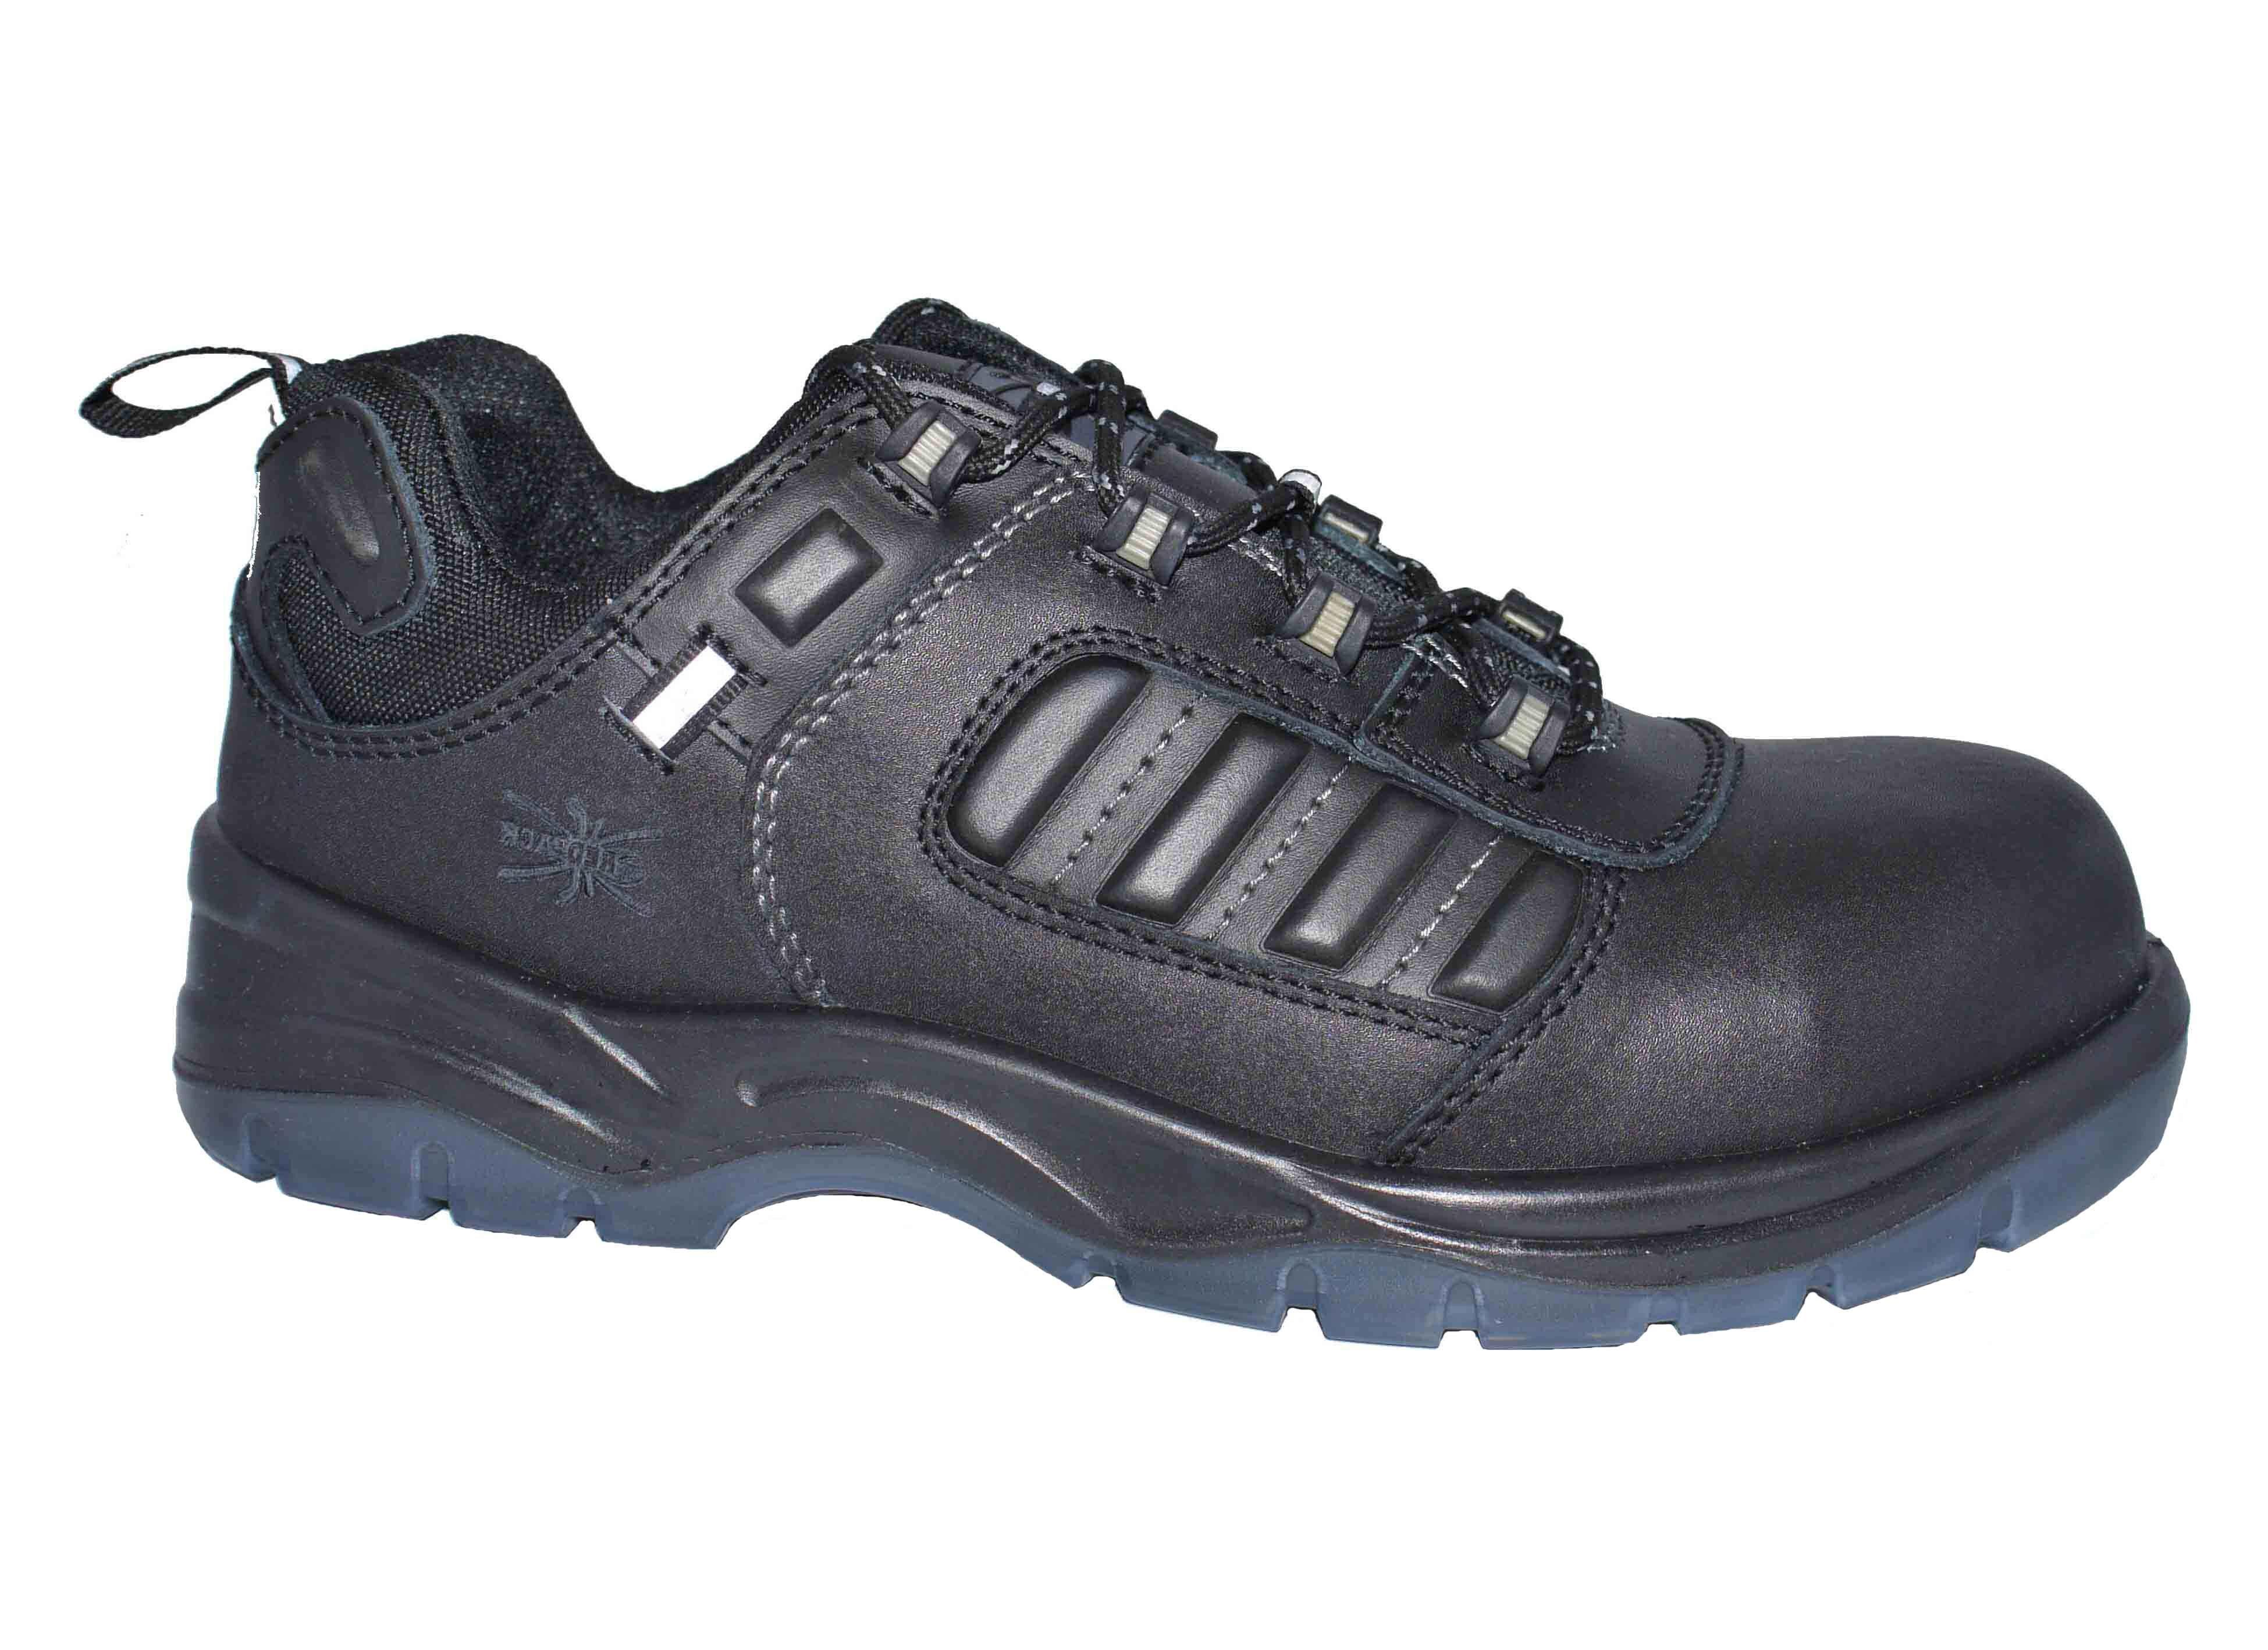 REDBACK Gold Safety Shoe S3 SRC